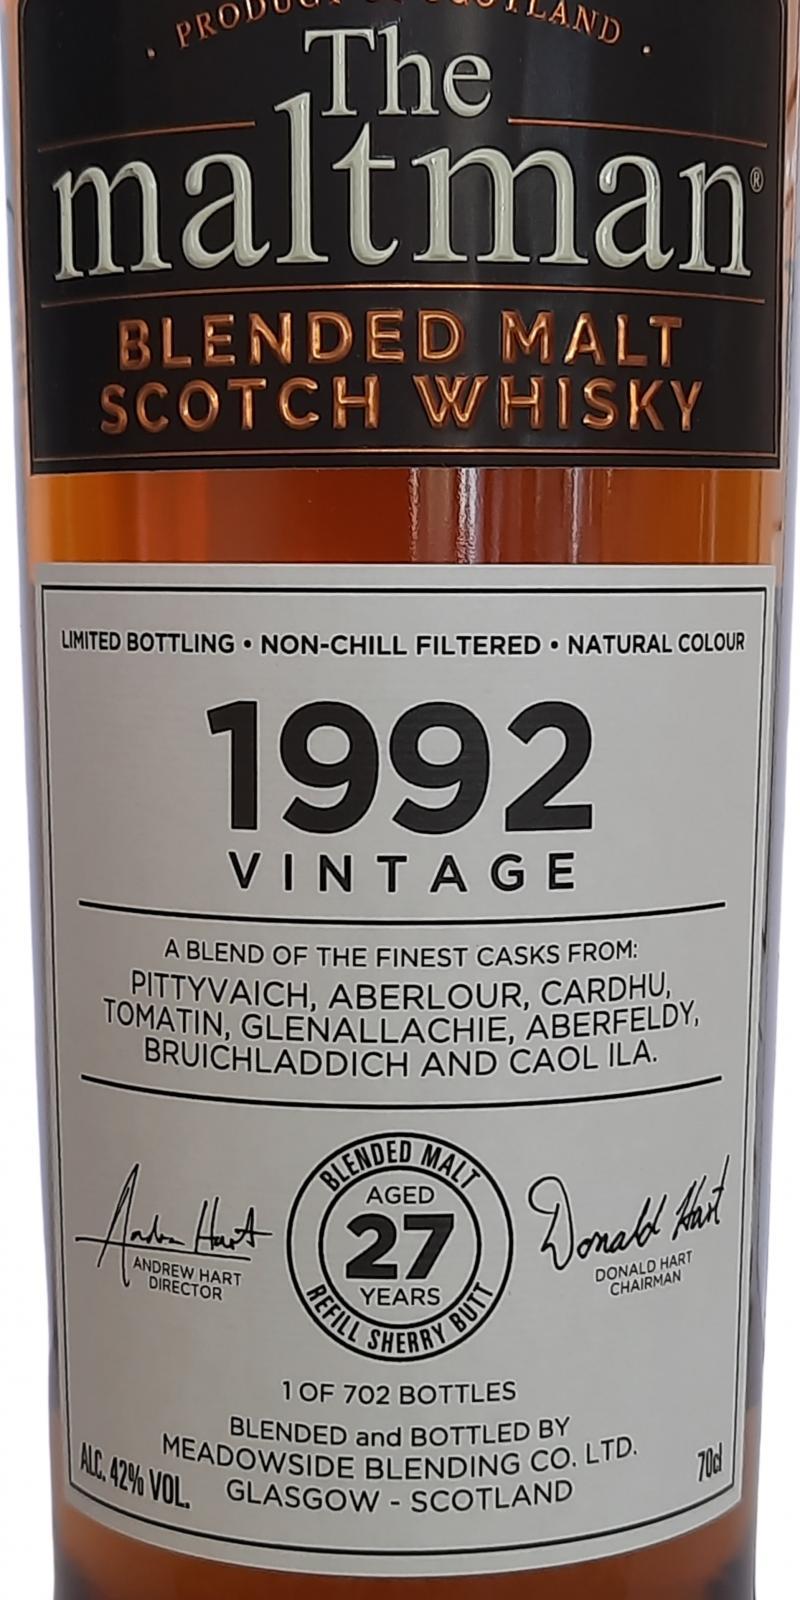 Blended Malt Scotch Whisky 1992 MBl